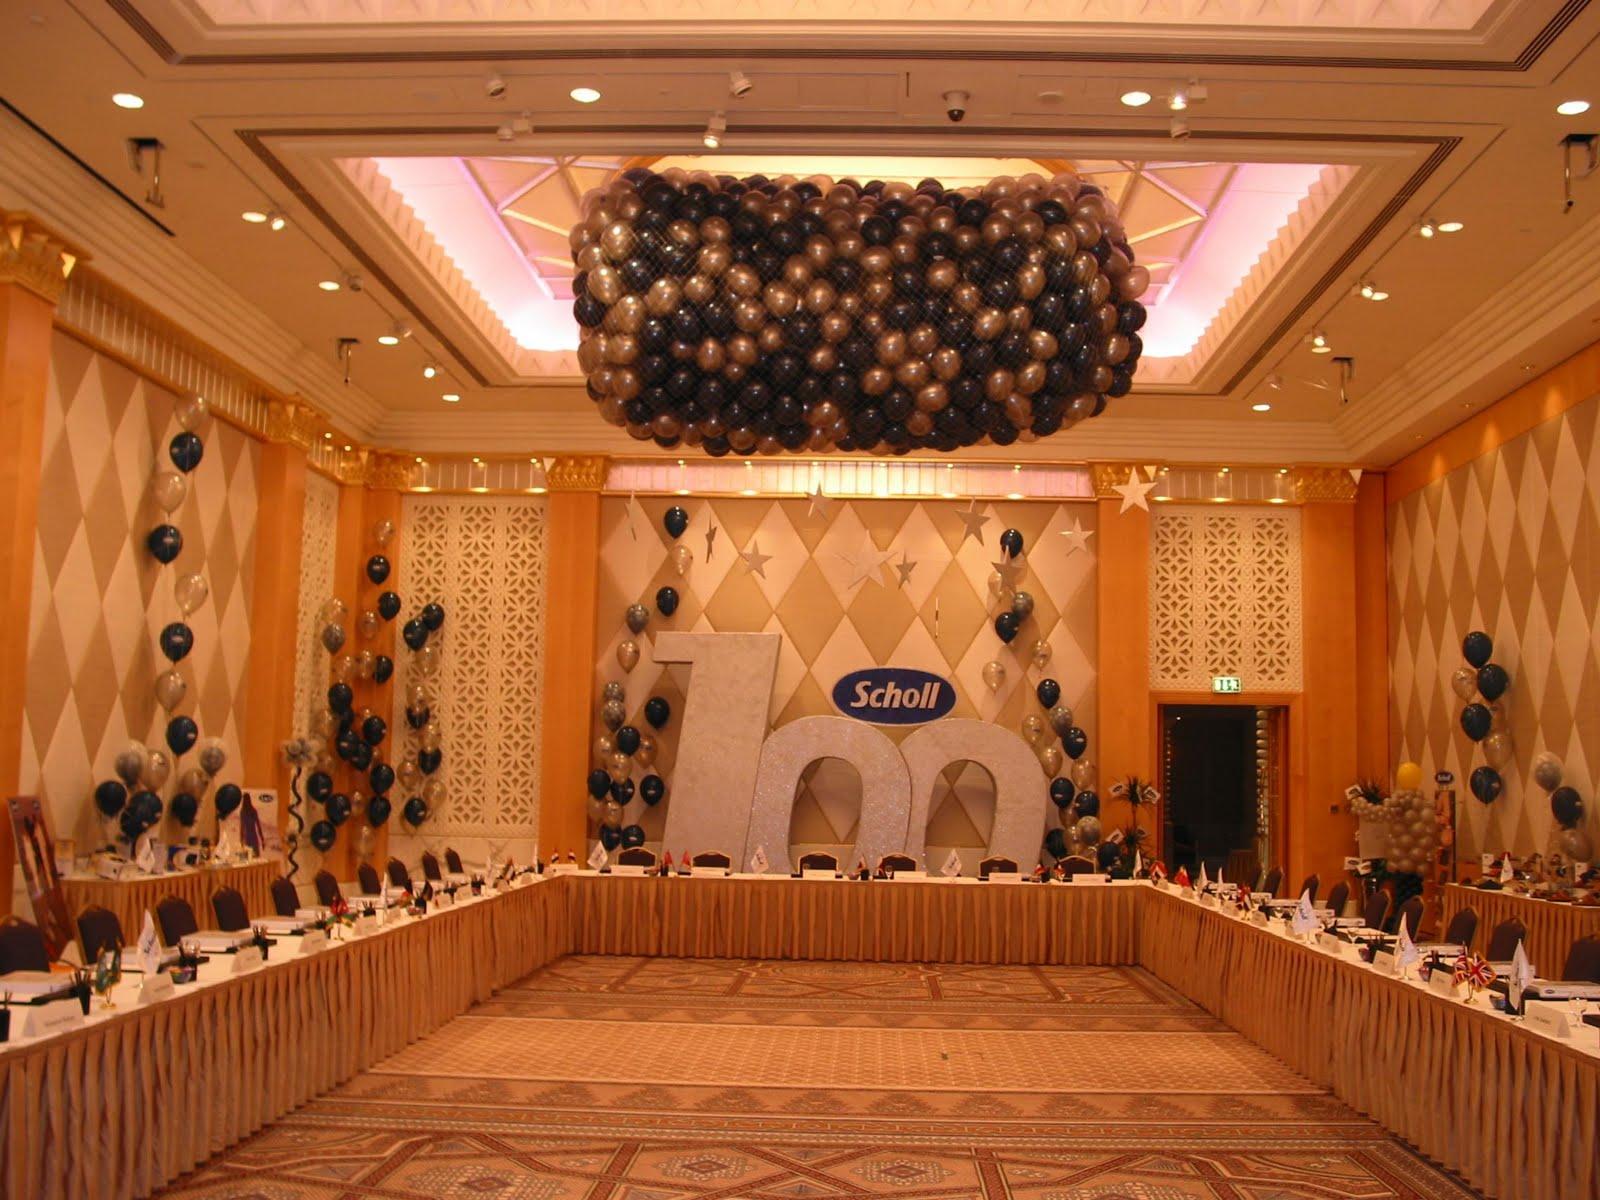 Wedding Decoration with Balloons 1600 x 1200 · 240 kB · jpeg